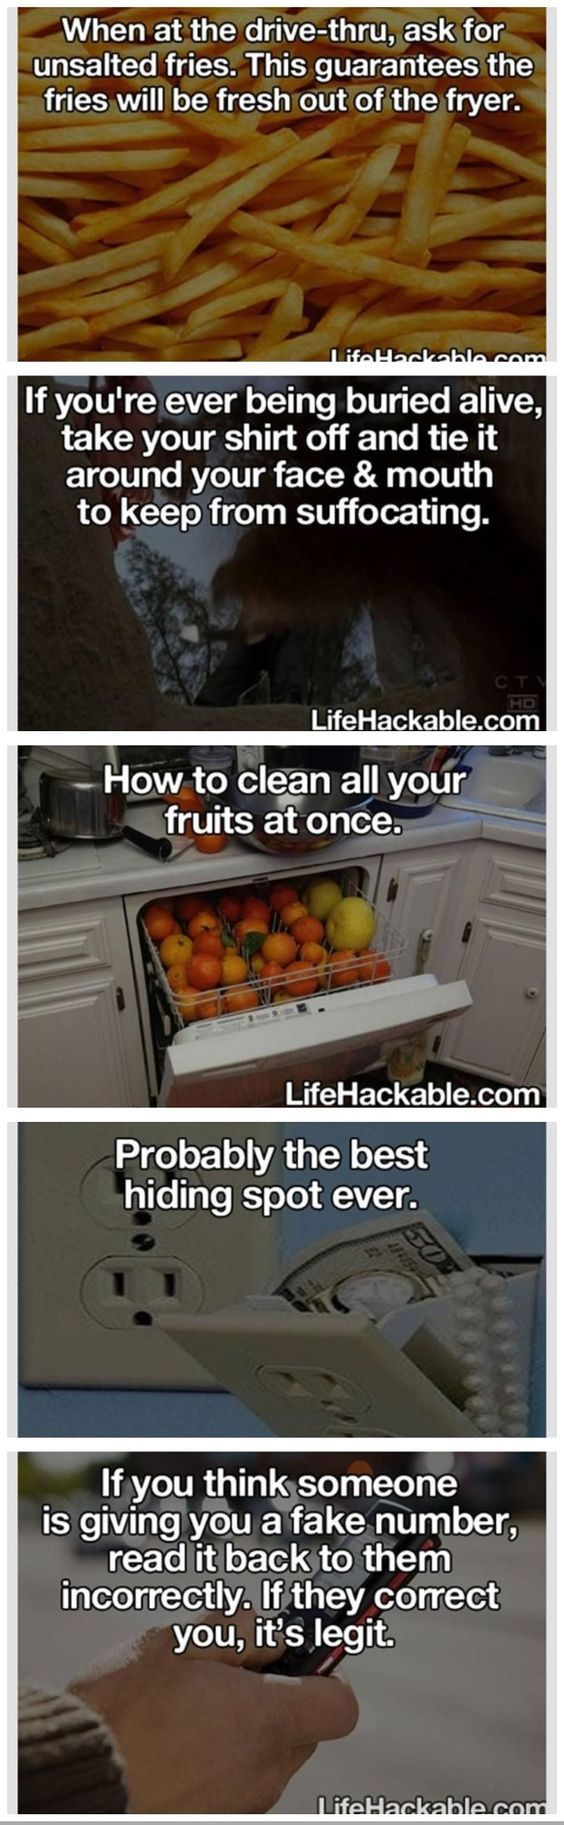 Some Cool Life Hacks